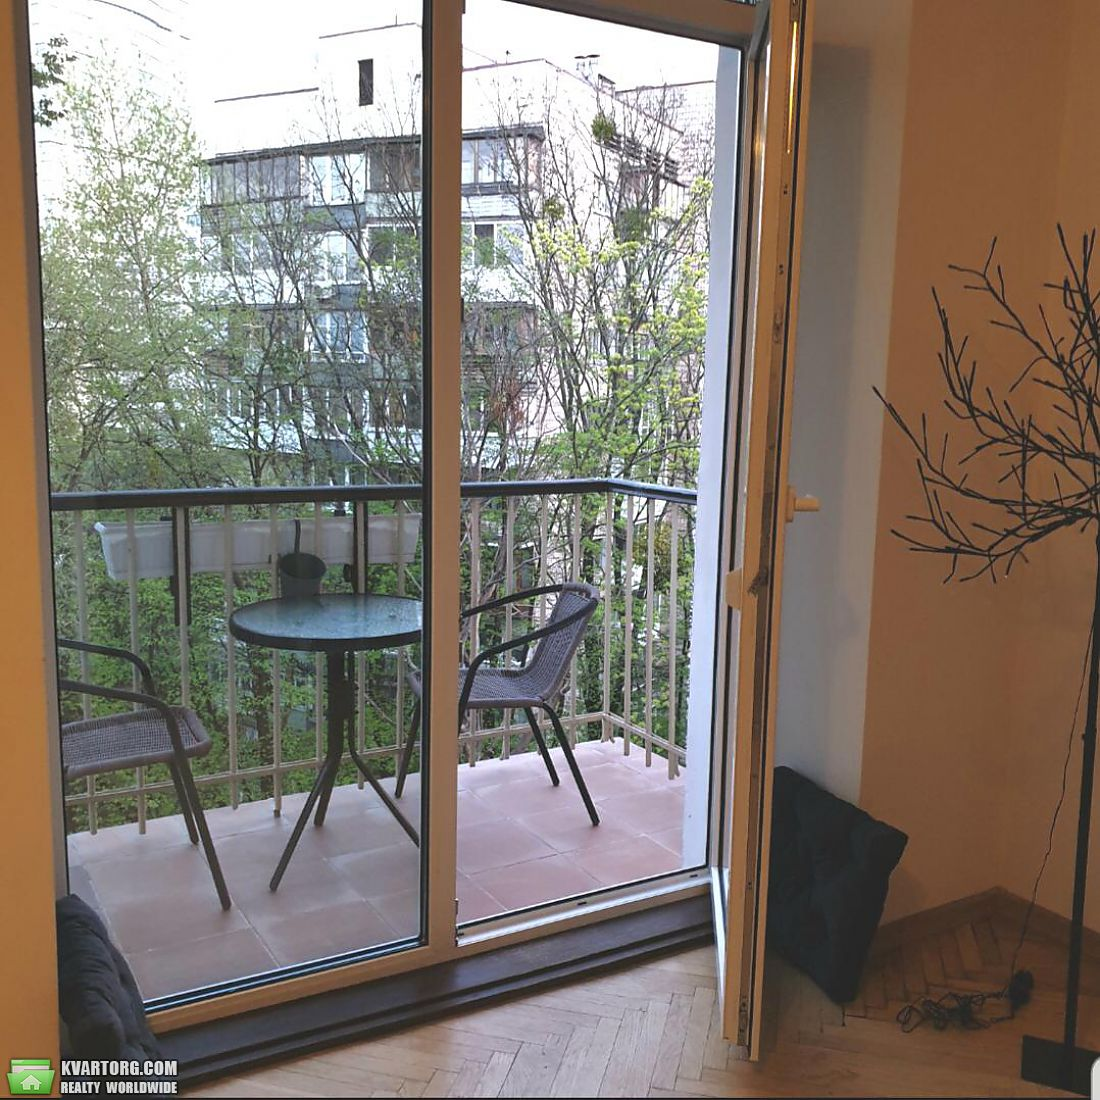 продам 2-комнатную квартиру Киев, ул. Орлика 22 - Фото 7